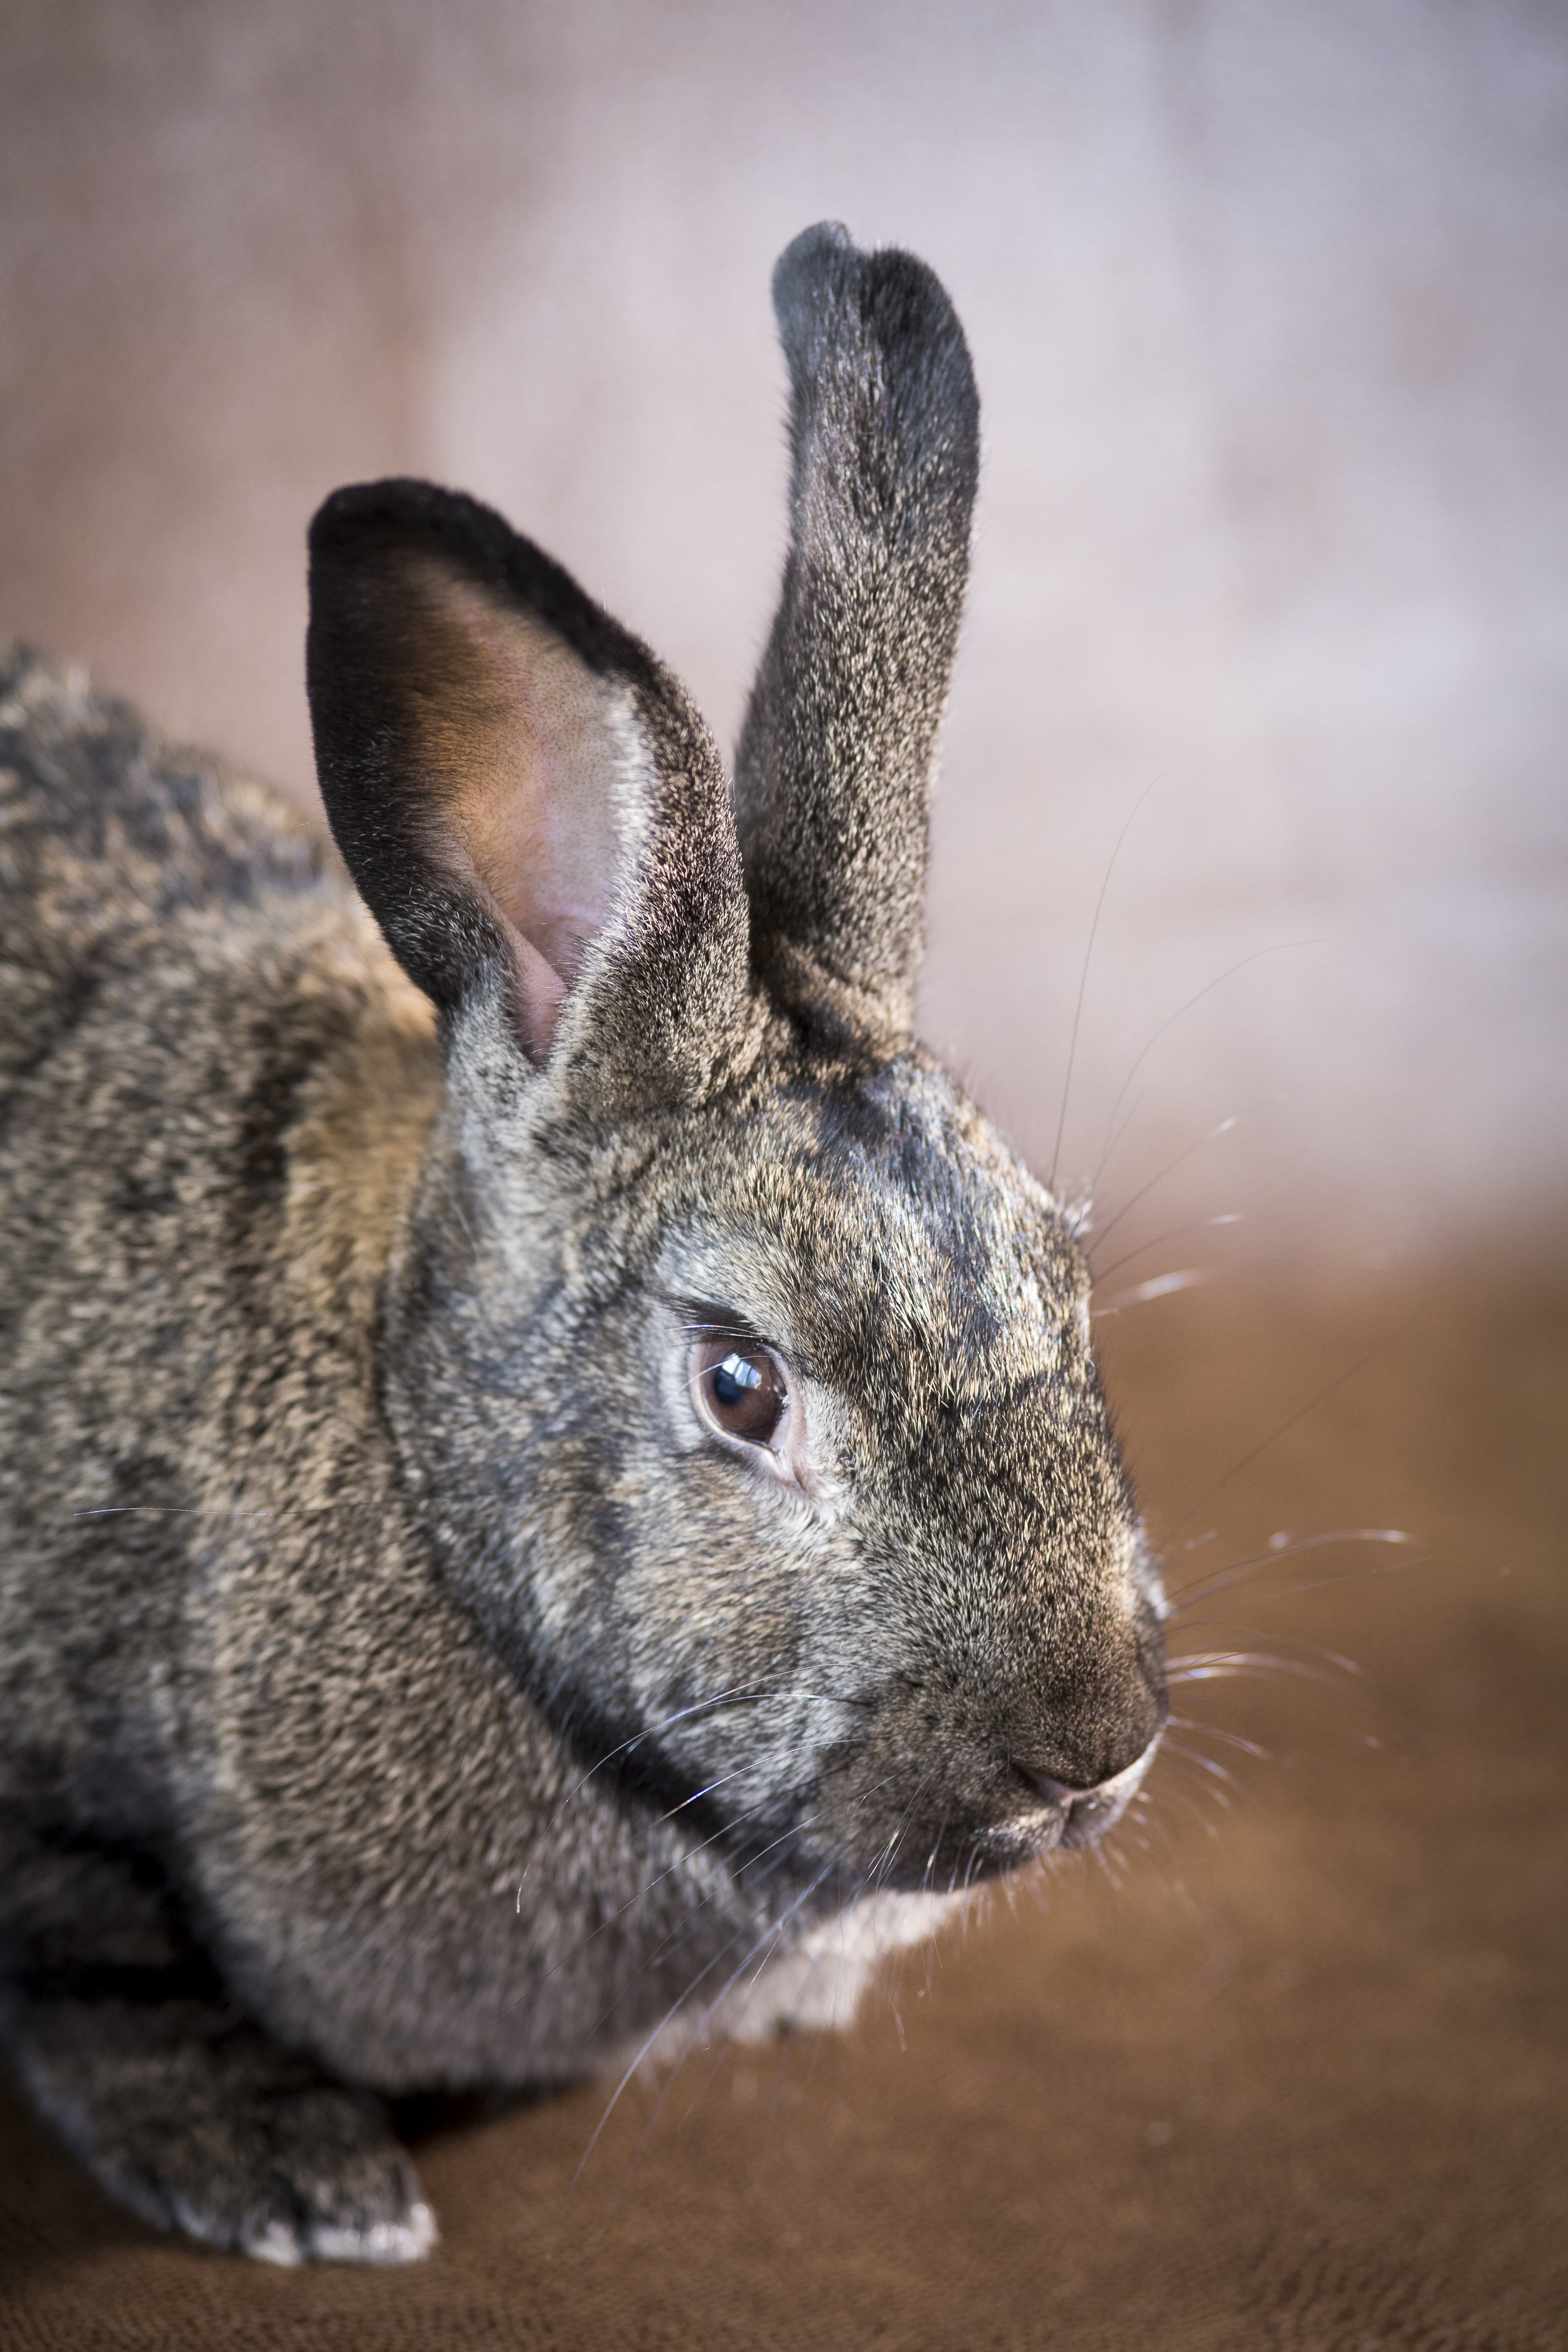 28 tan and black bunny rabbit pet photography studio session on worn leather fabric.jpg